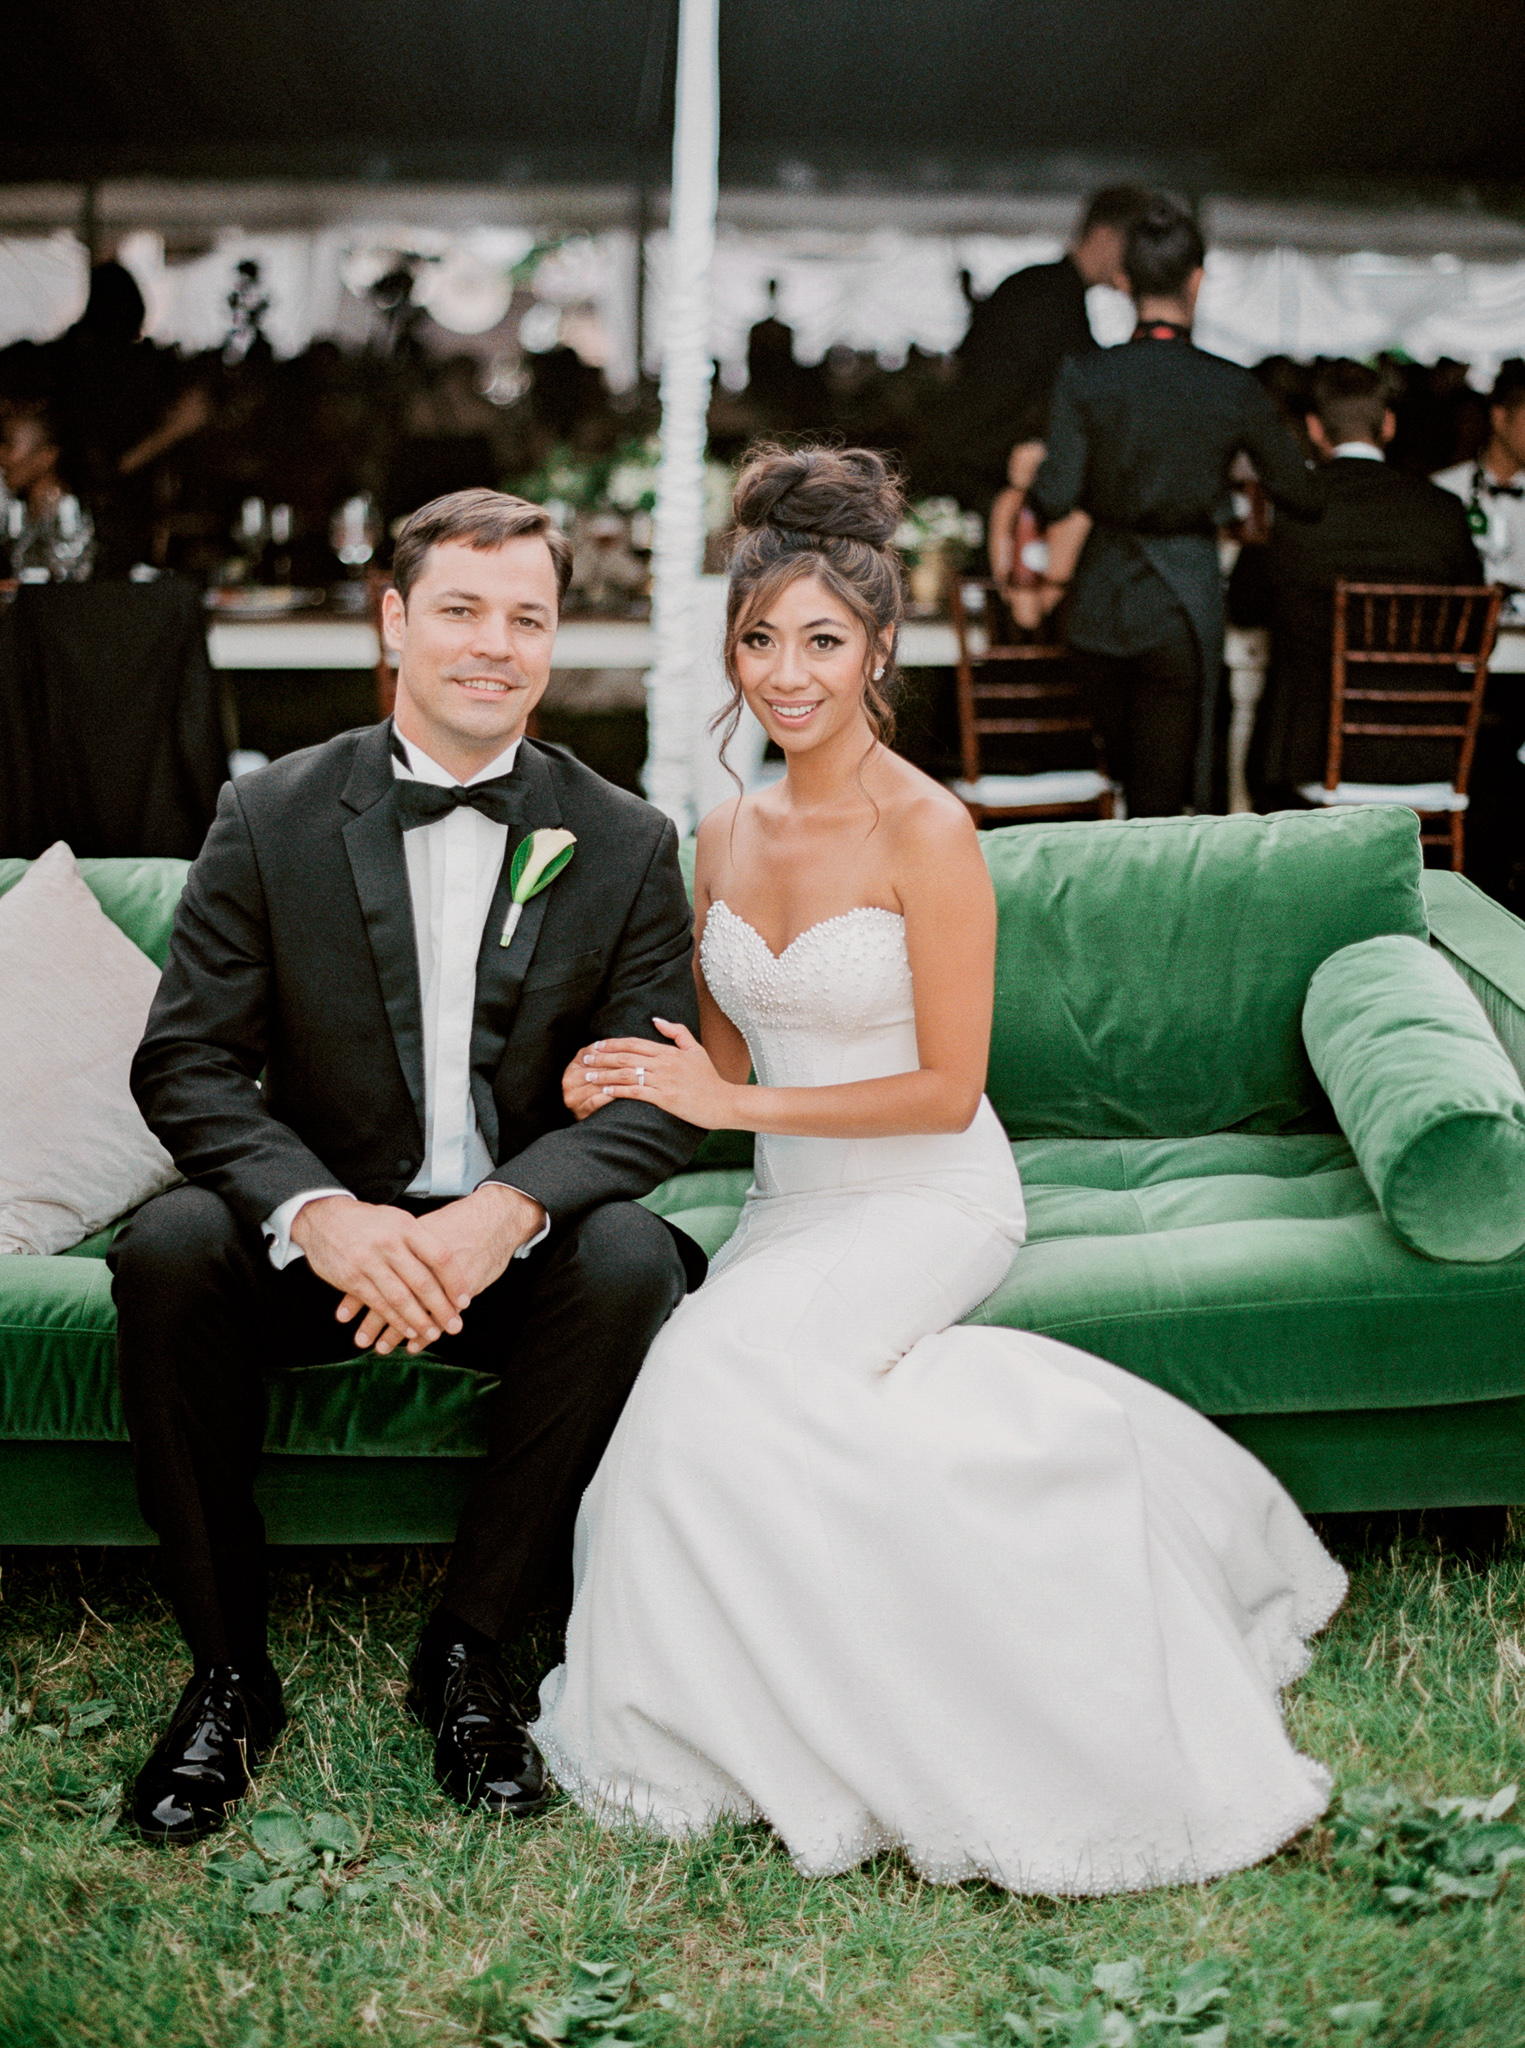 180OutliveCreative_Travel_Photographer_Videographer_Lewis&Clark_Oregon_Elegant_BlackTie_Destination_Wedding.jpg